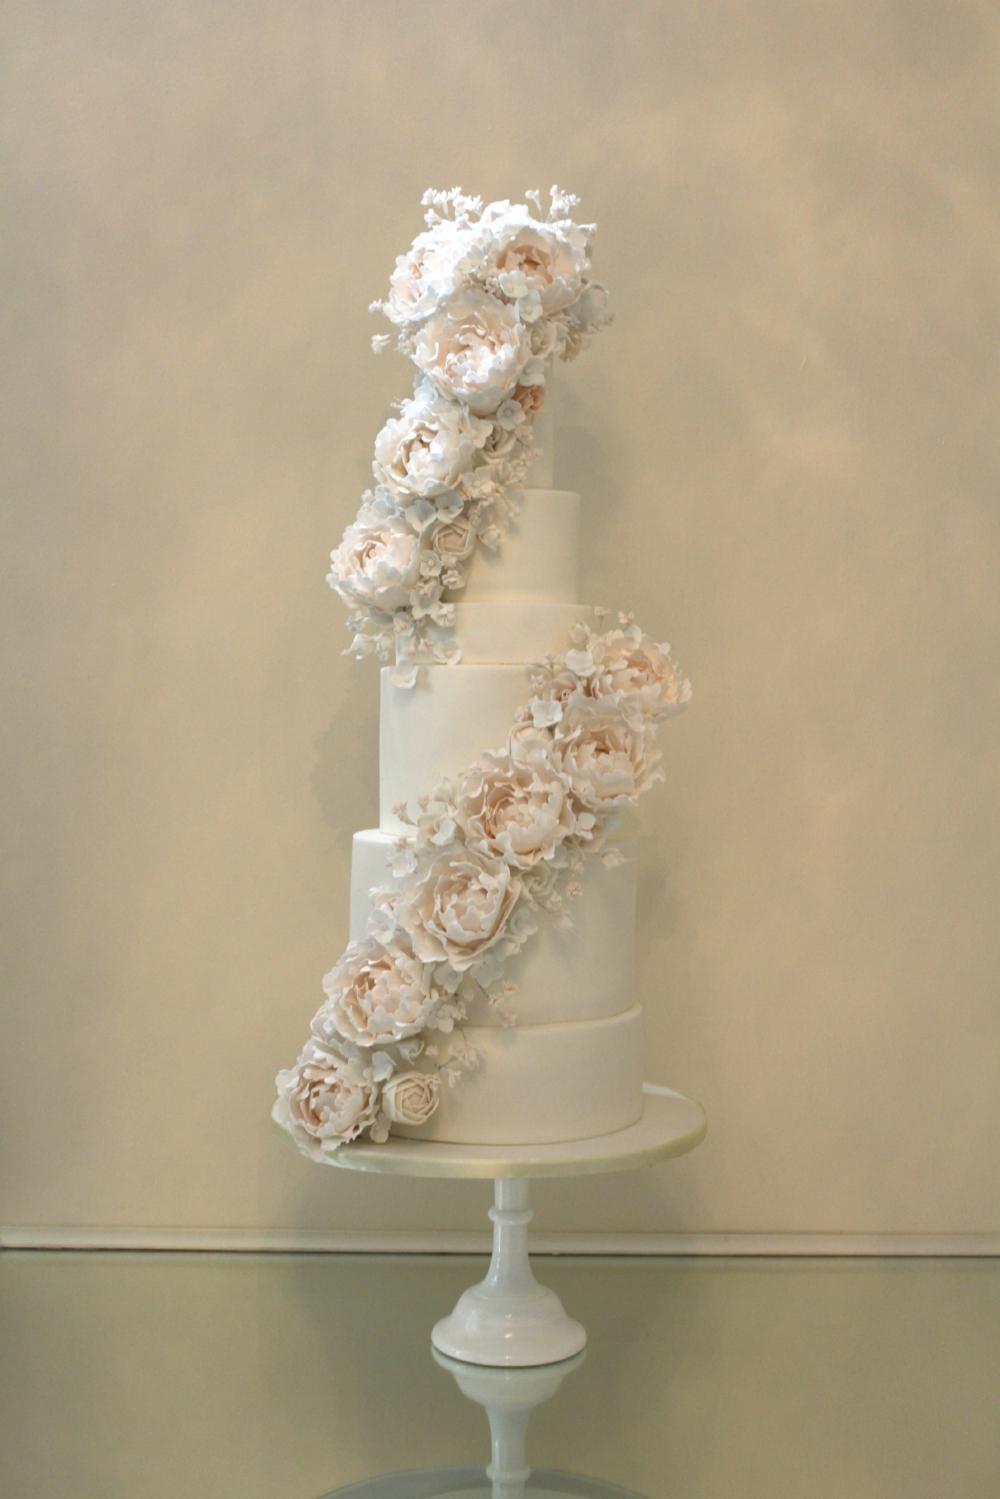 rosewood cakes - jordana events - bridal garden - glasgow - high end weddings